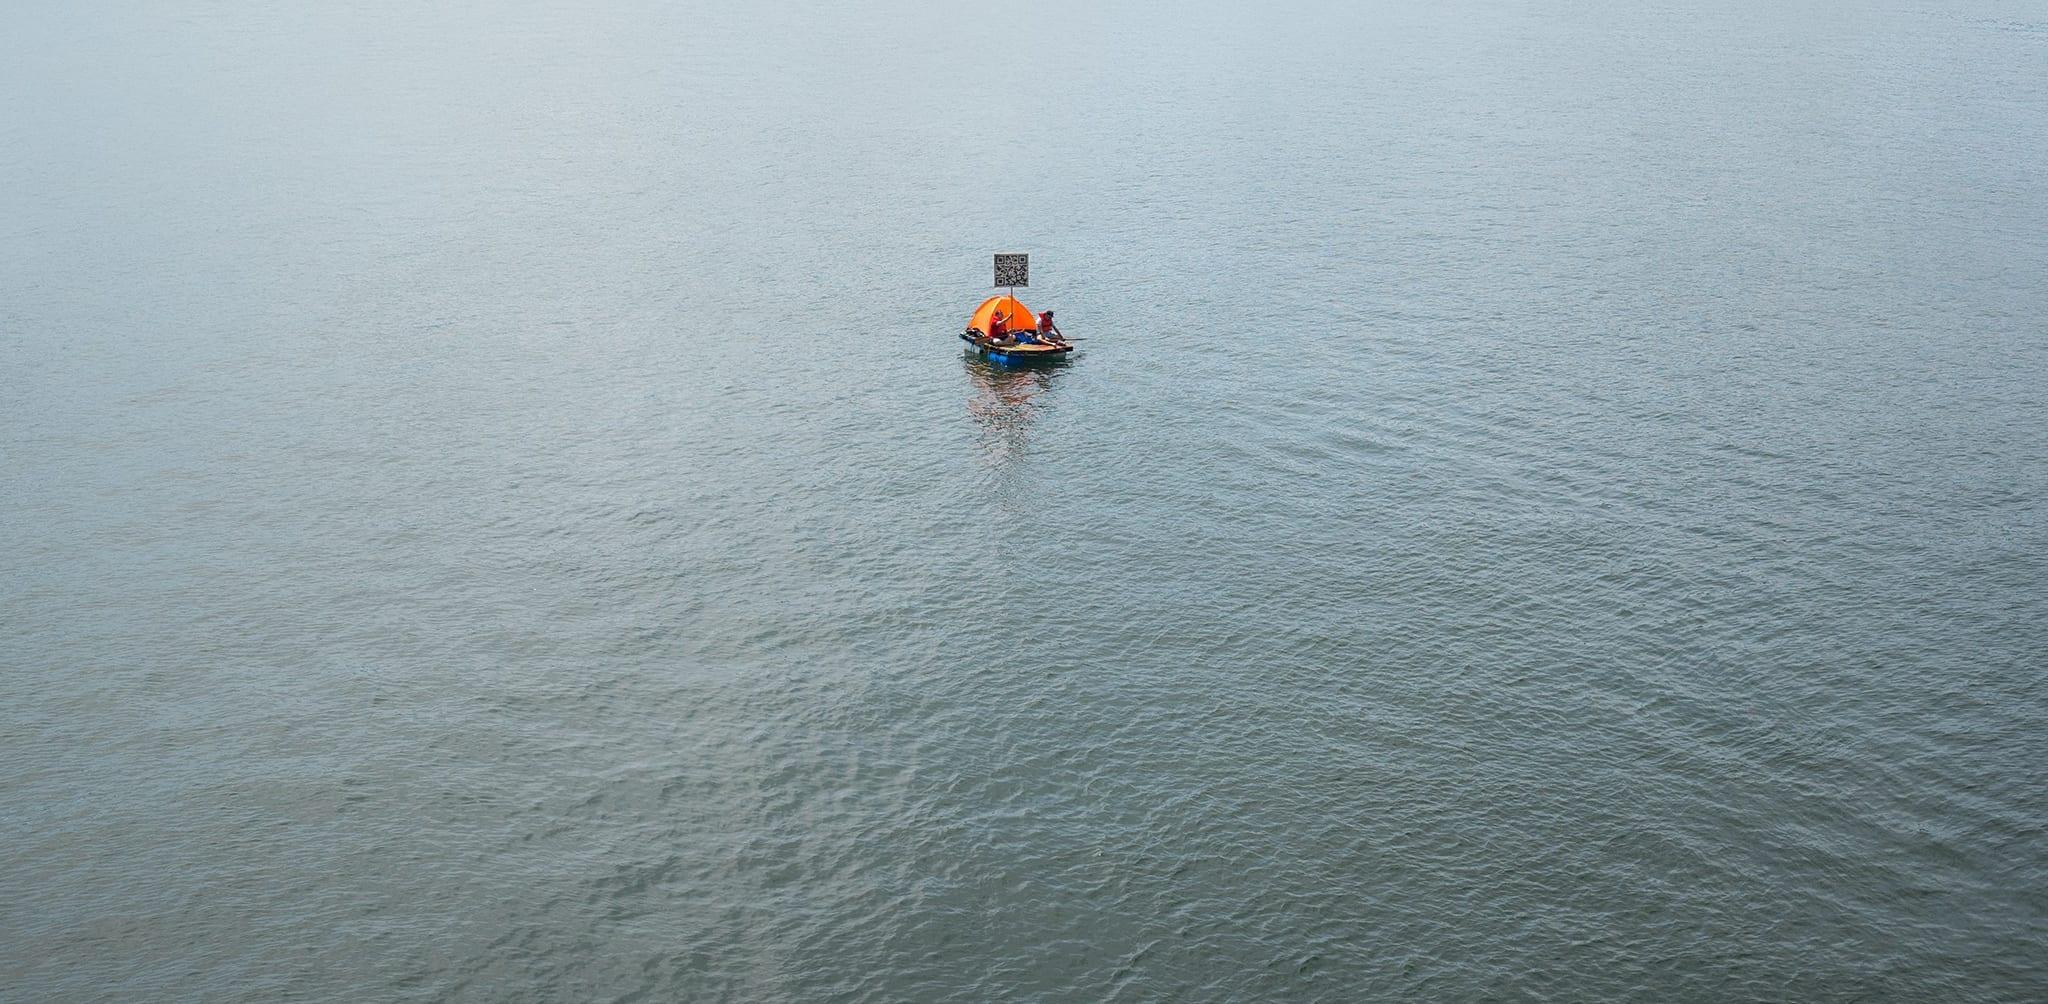 The Raft of ______ by Tsubasa Kato